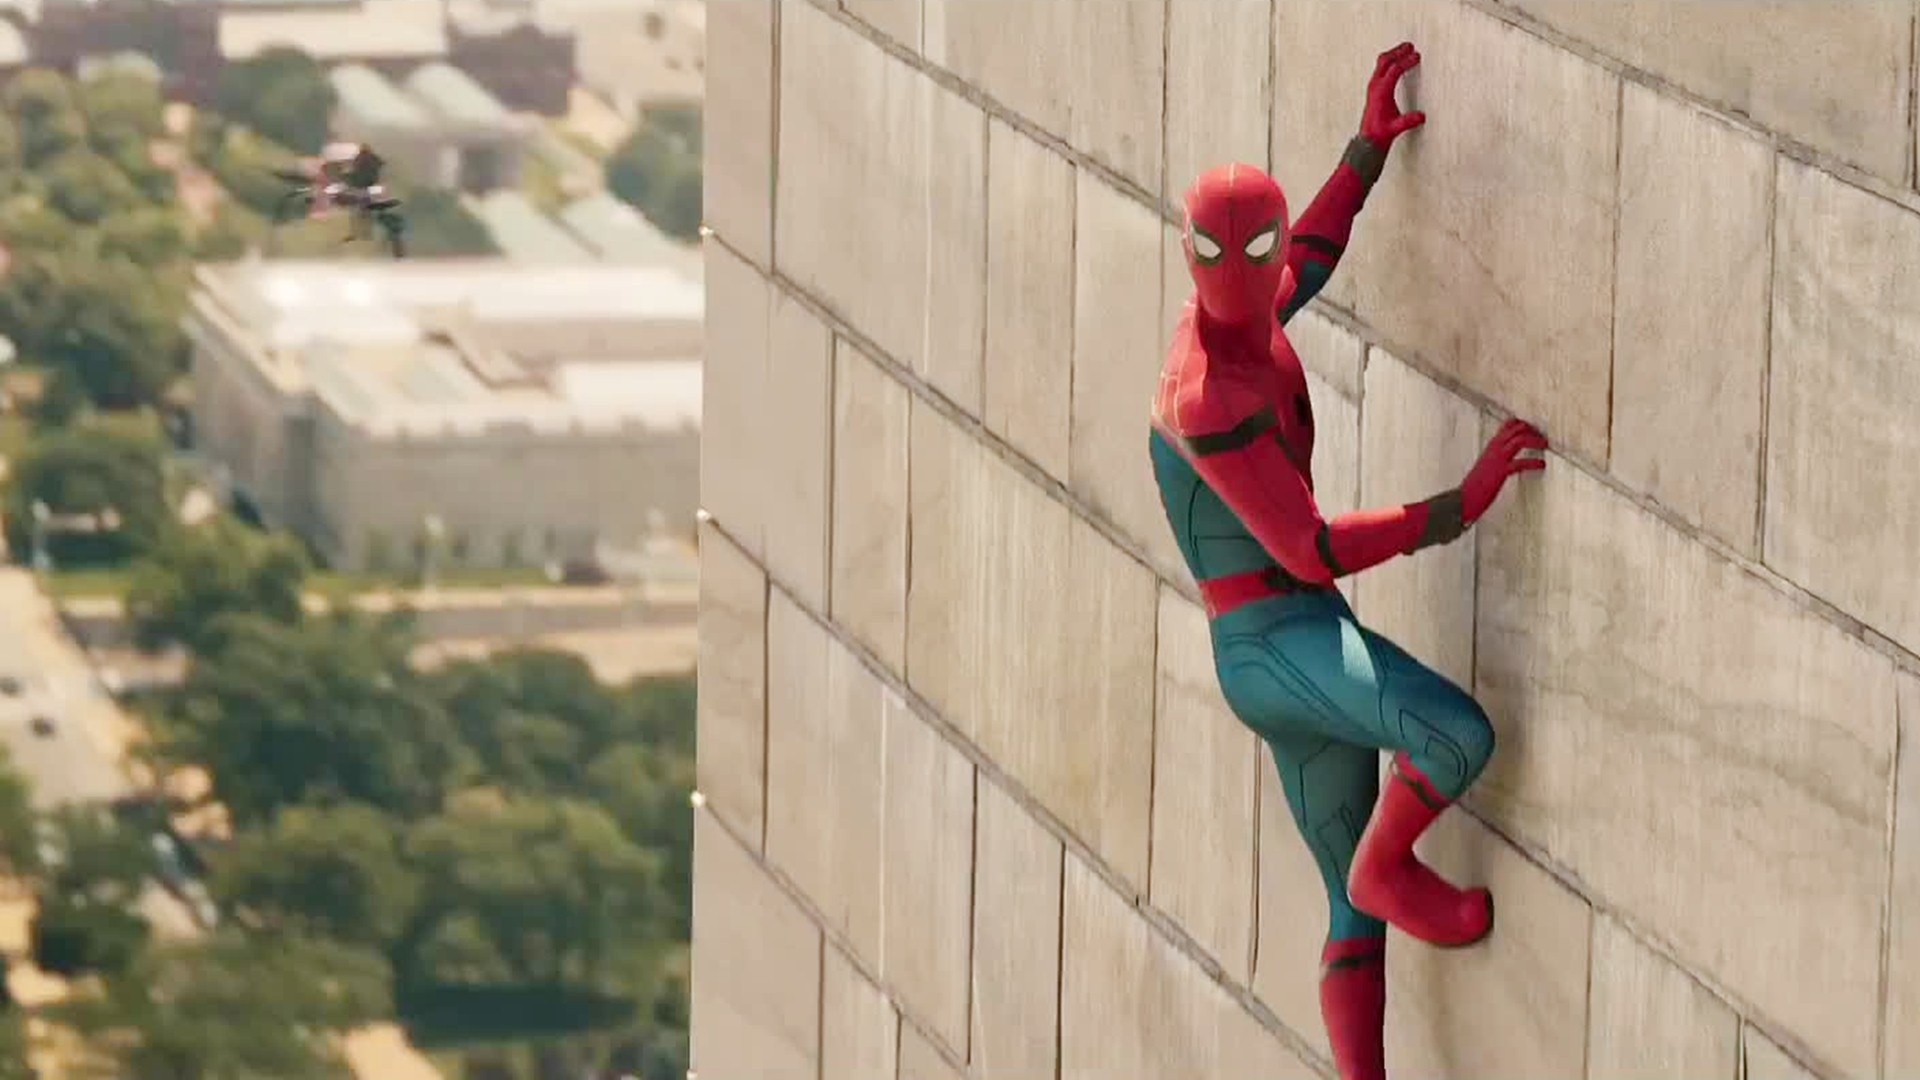 Spider-Man-Homecoming-HQ-Desktop-Wallpaper-15459